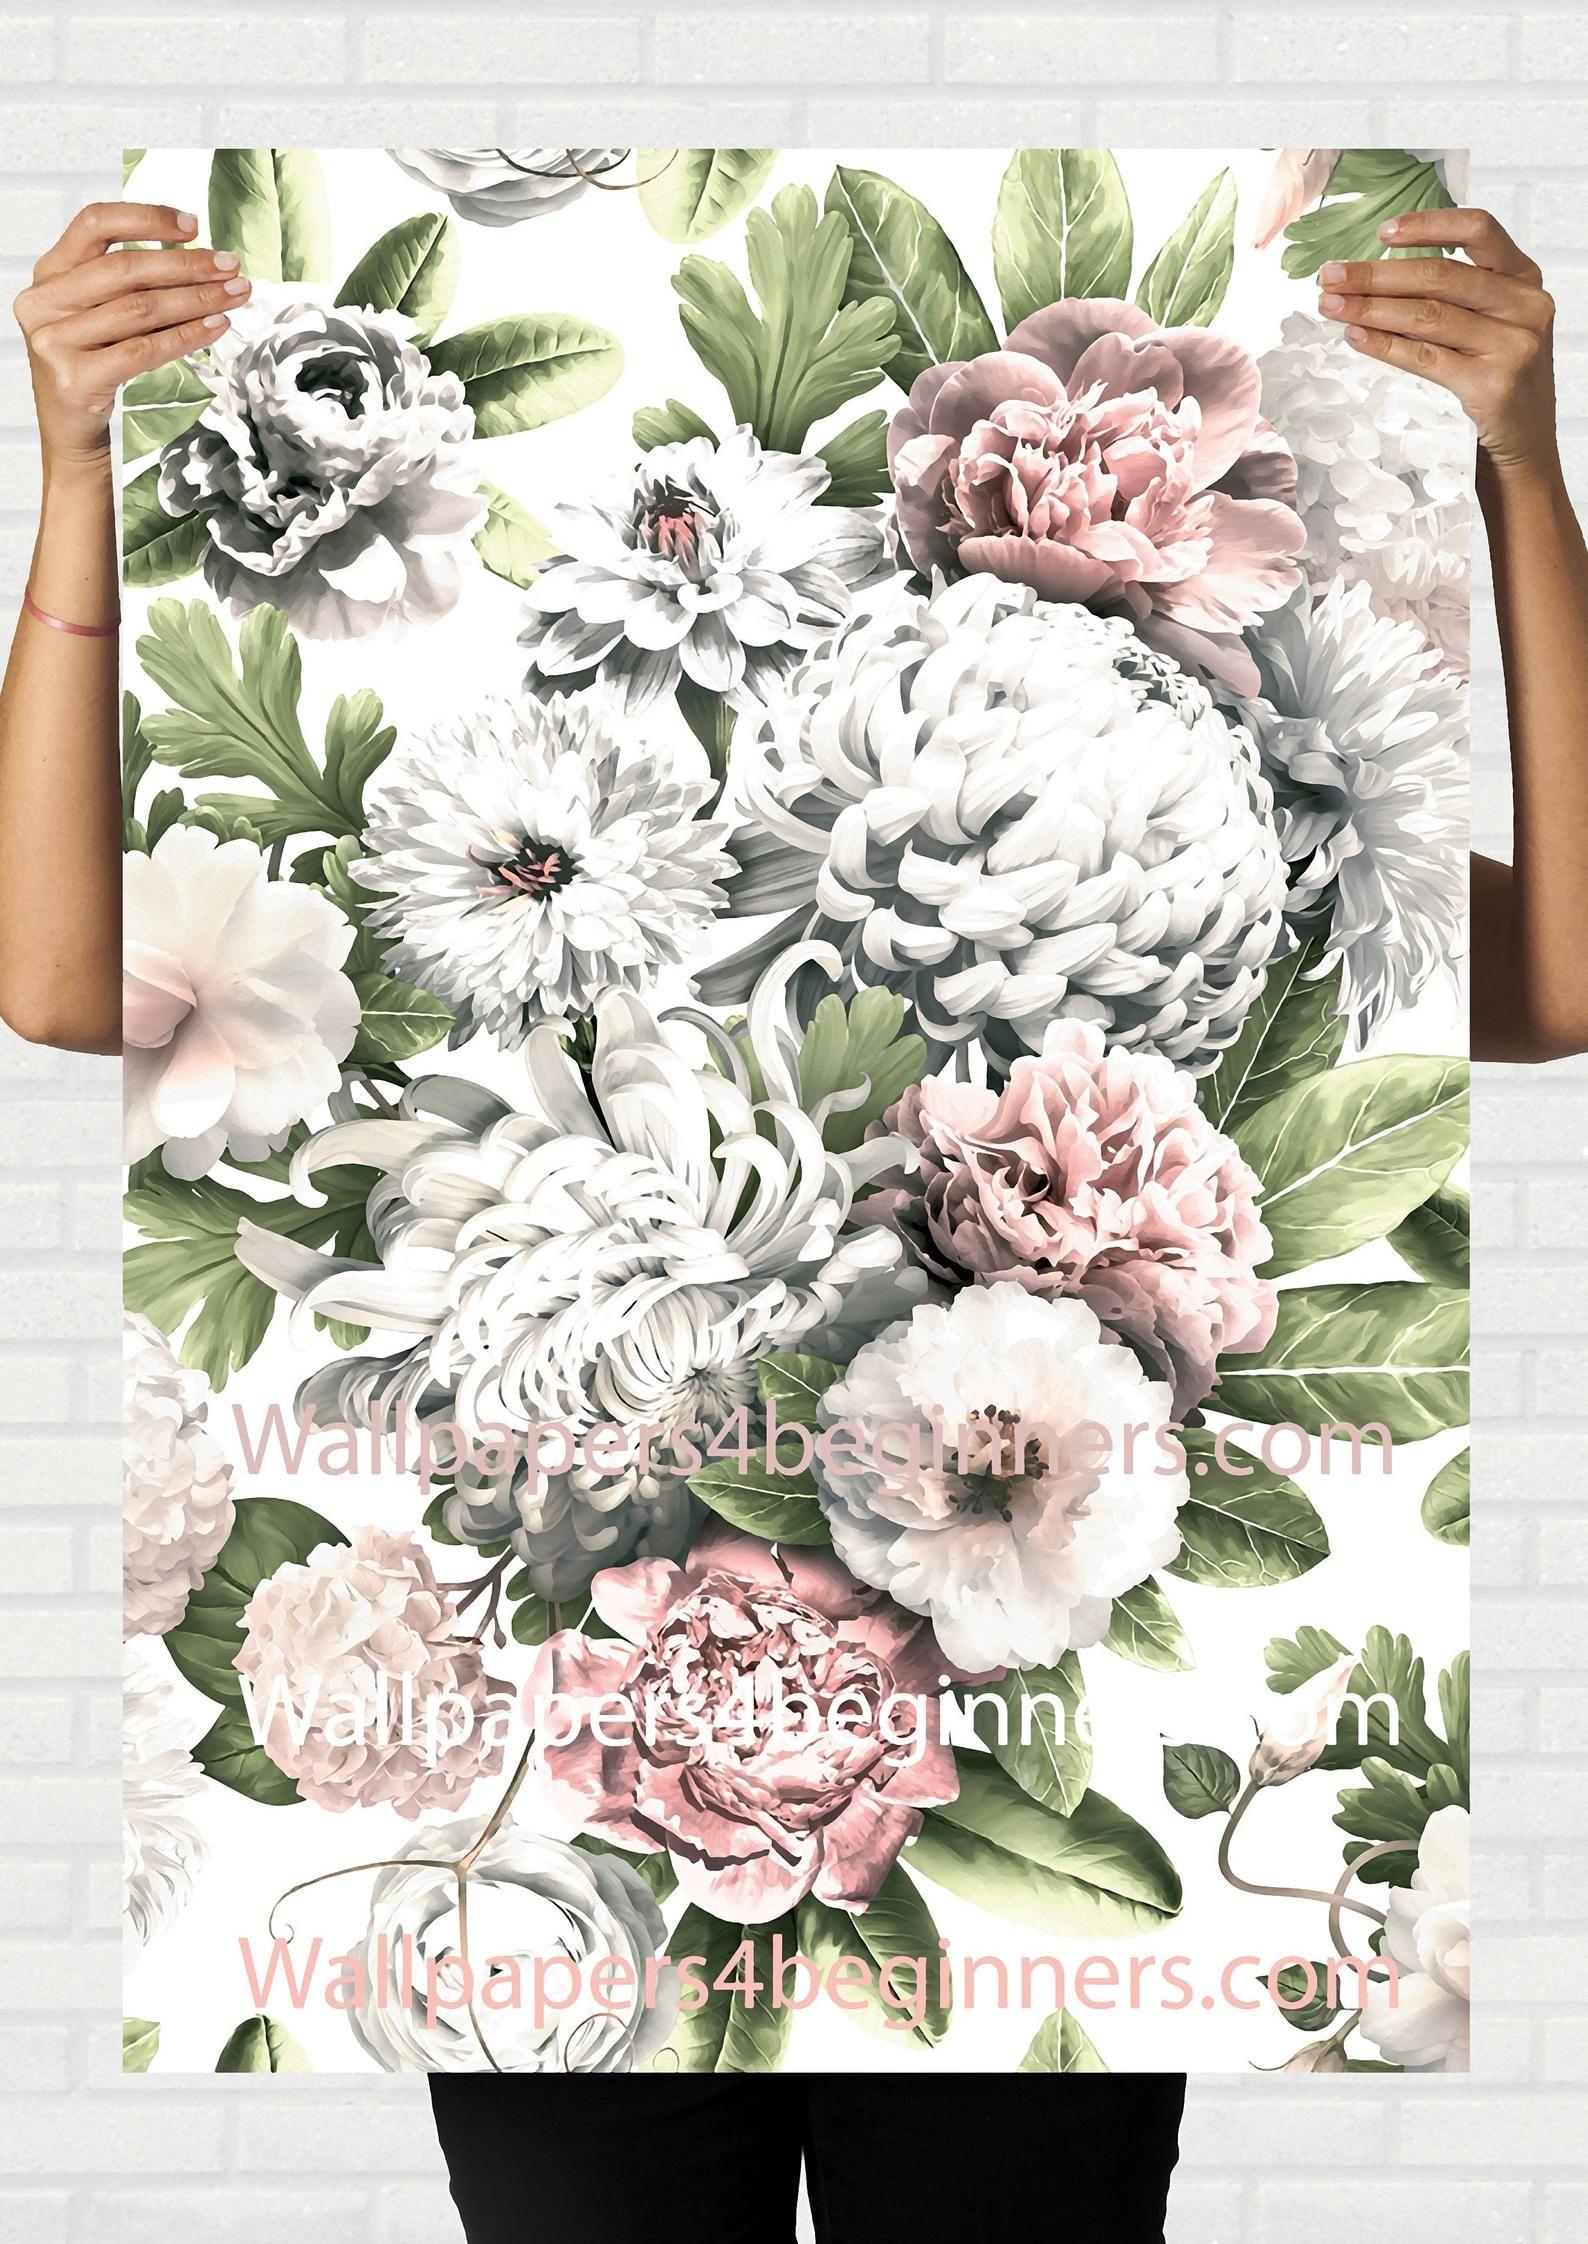 Light Floral Wallpaper Peonies Floral Wallpaper Peony Wallpaper